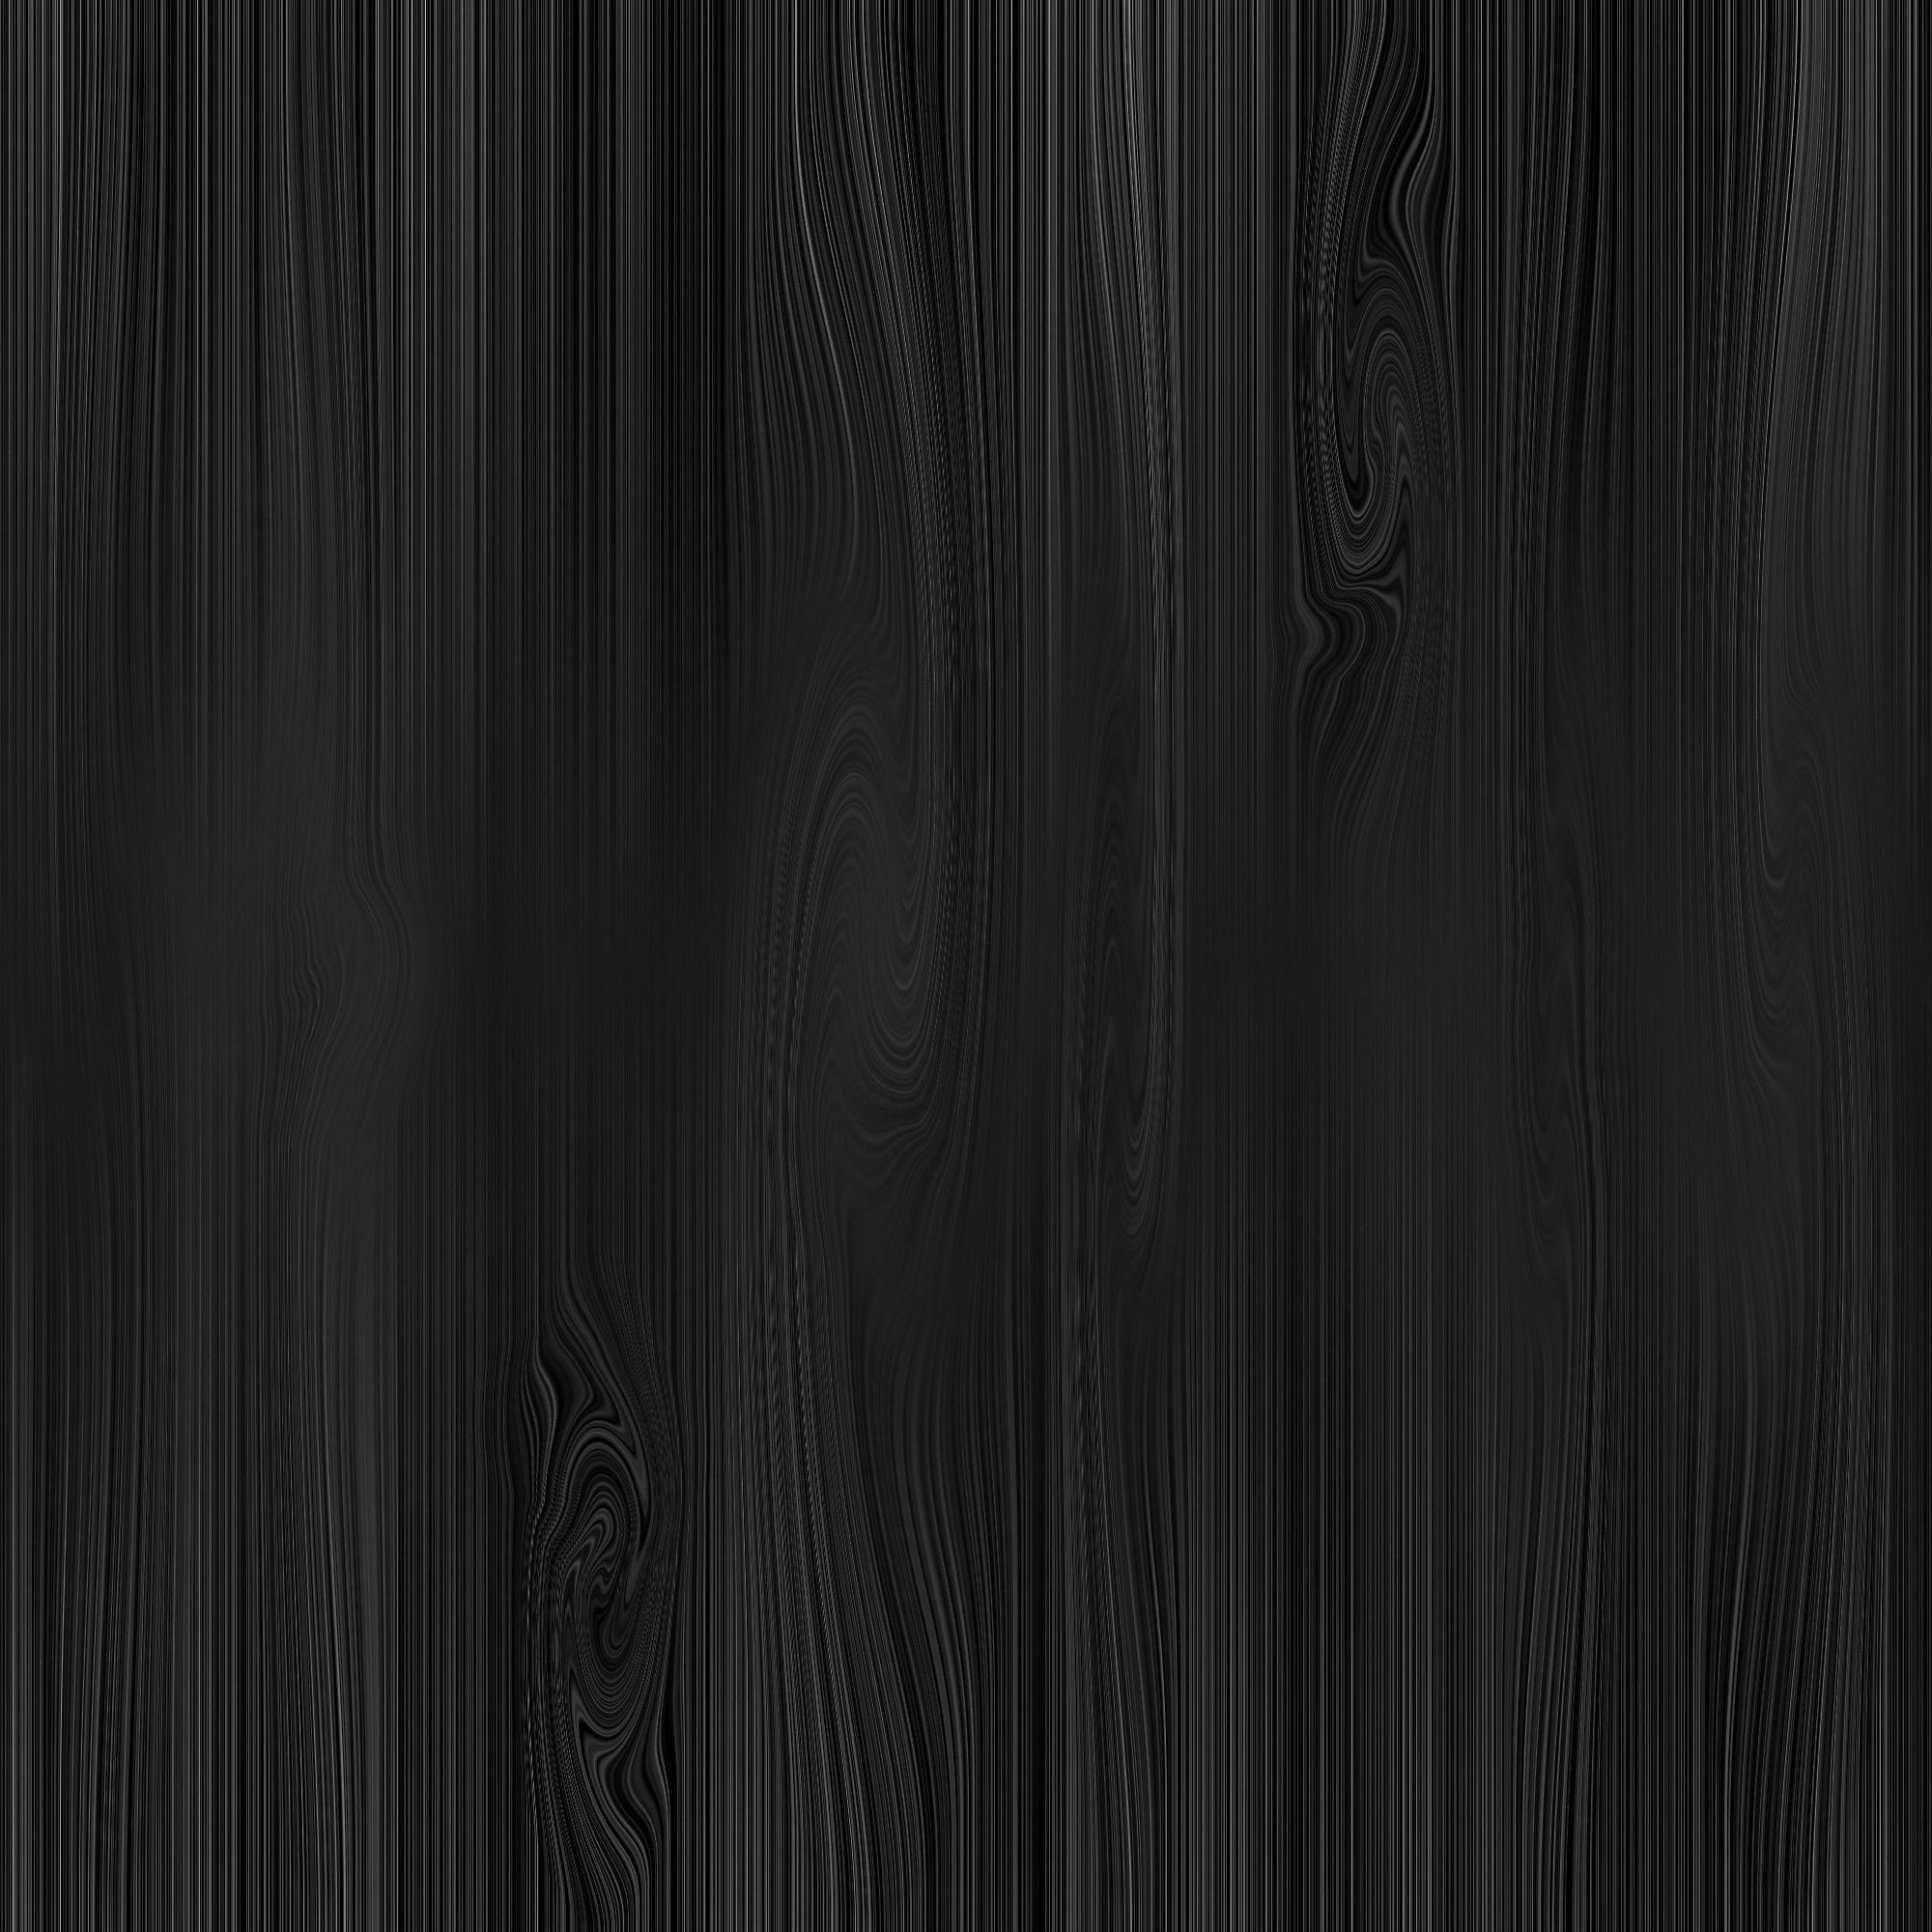 Background Through Train Background Black Wood Grain Texture Board Black Wood Grain Background Black Wood Background